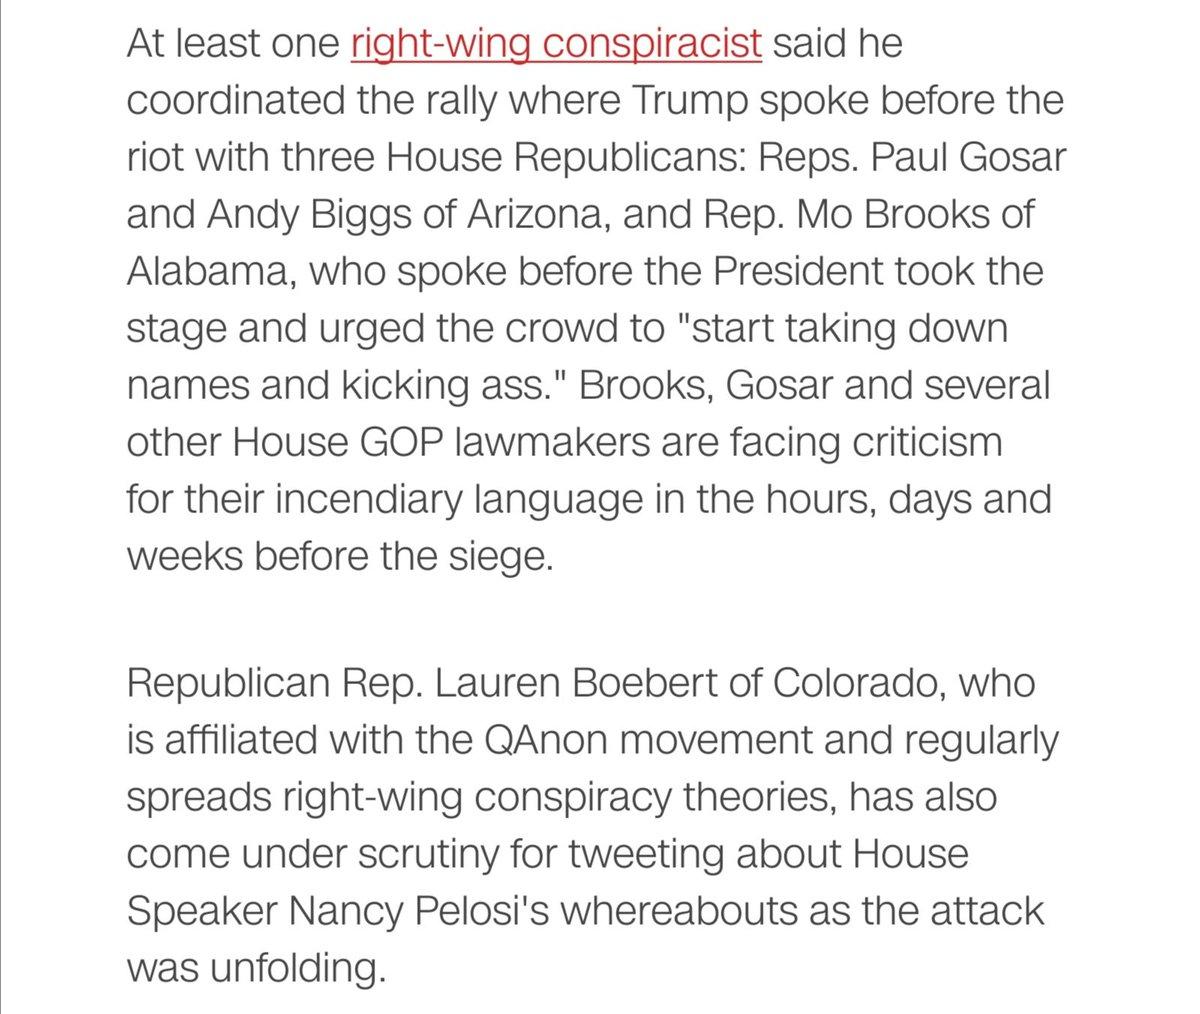 ENABLERS ACCOMPLICES  #MoBrooks #PaulGosar #AndyBiggs #LaurenBoebert  #GOP #VichyRepublicans #Kristallnacht  #CapitolRiot #CapitolHill #CoupAttempt #TrumpTreason #Trump #Washington #Inauguration2021